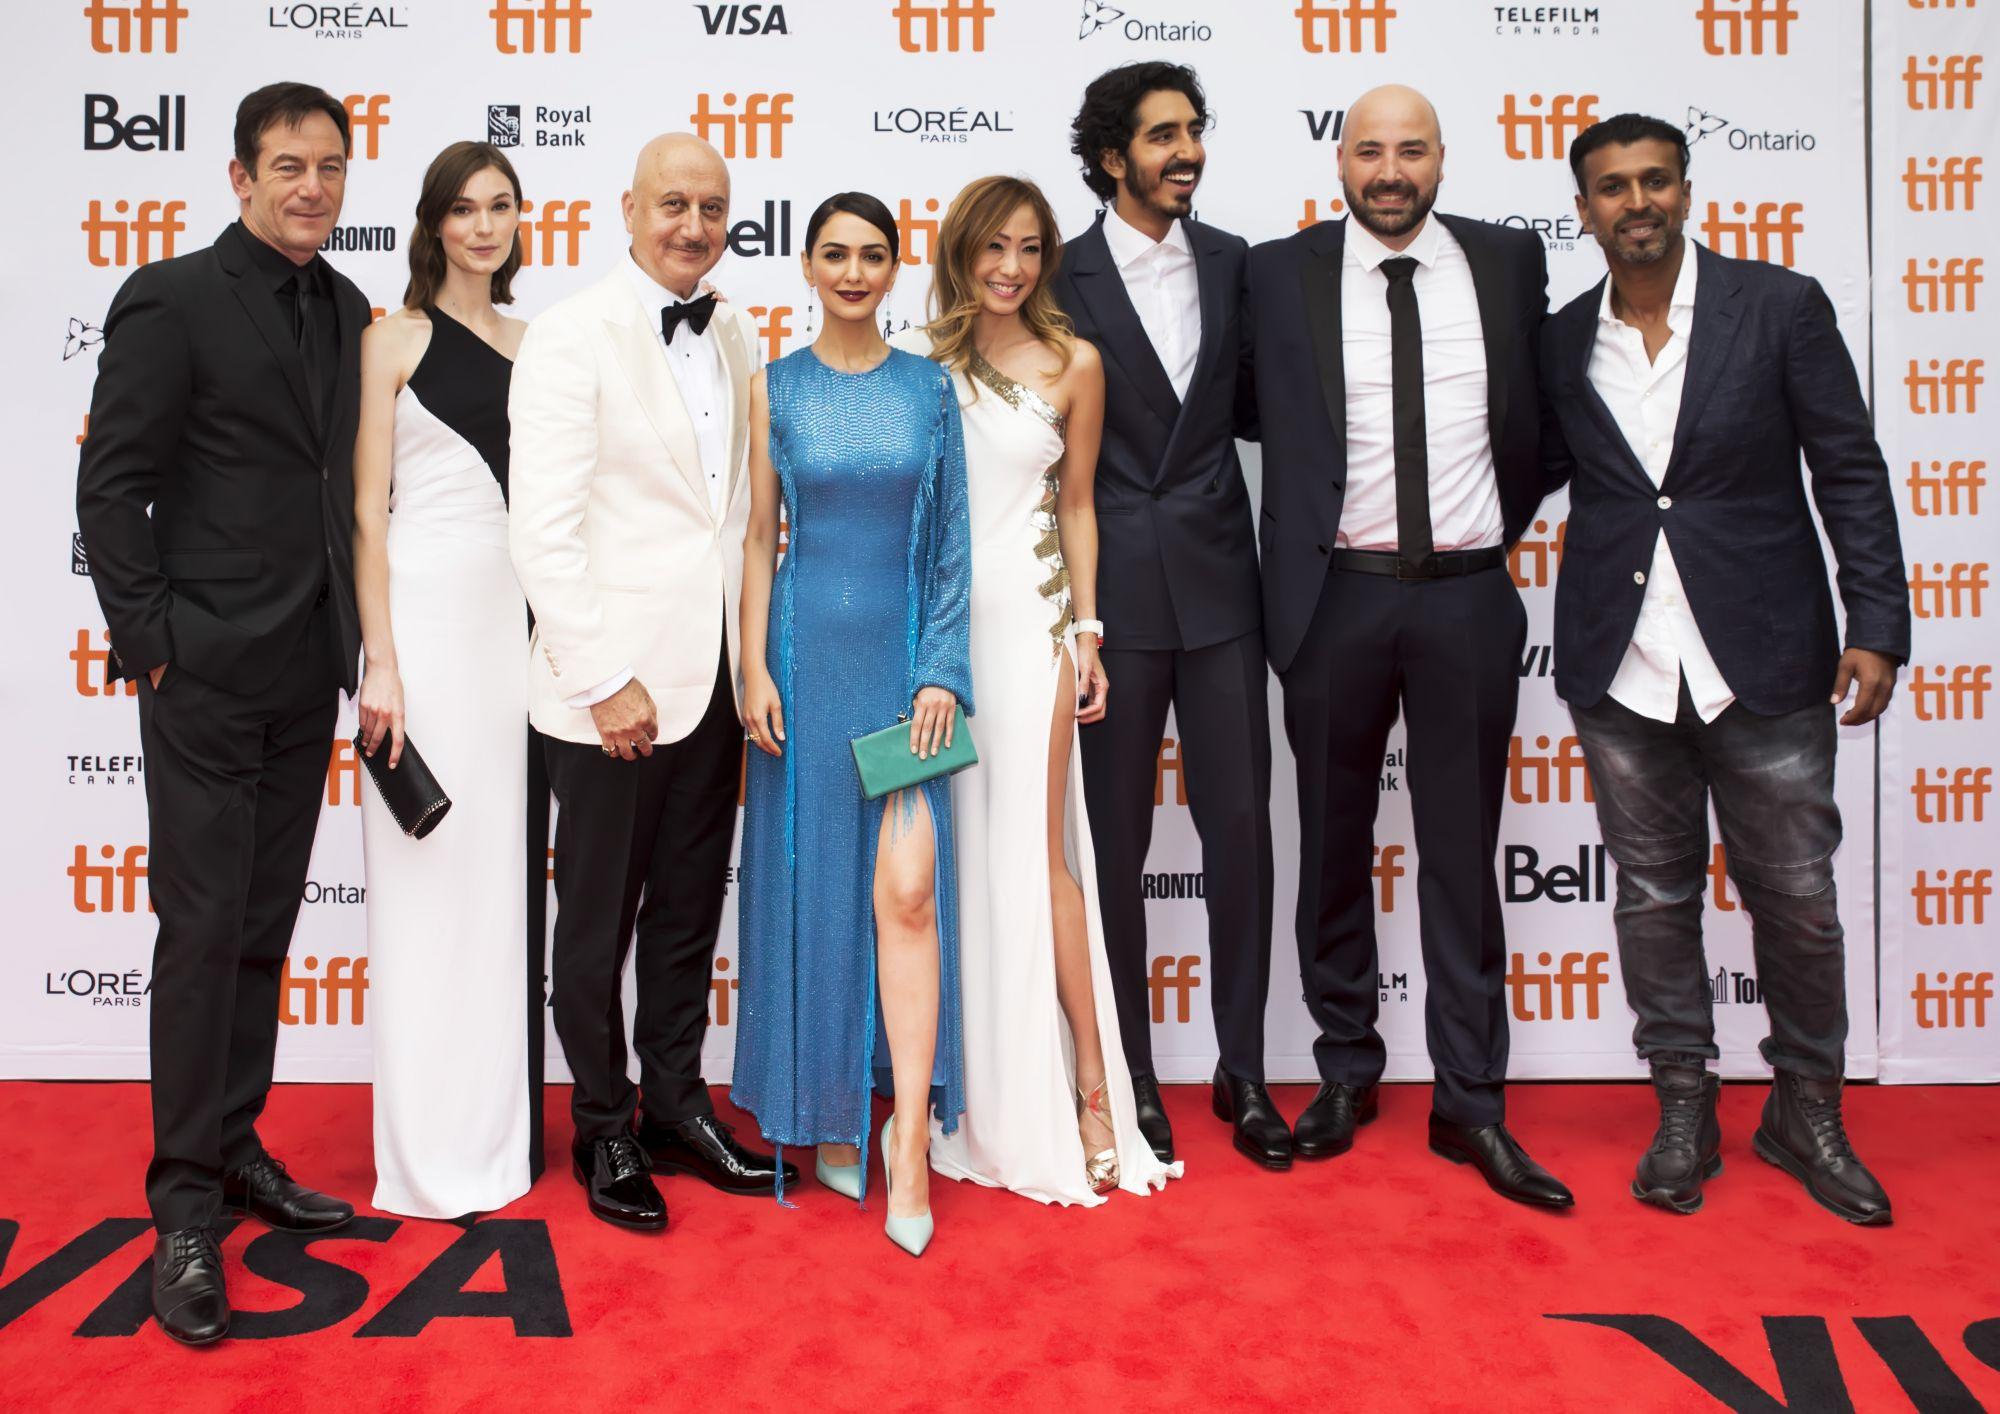 Jason Isaacs, Tilda Cobham-Hervey, Anupam Kher, Nazanin Boniadi, Tan Min-Li, Dev Patel, Anthony Maras